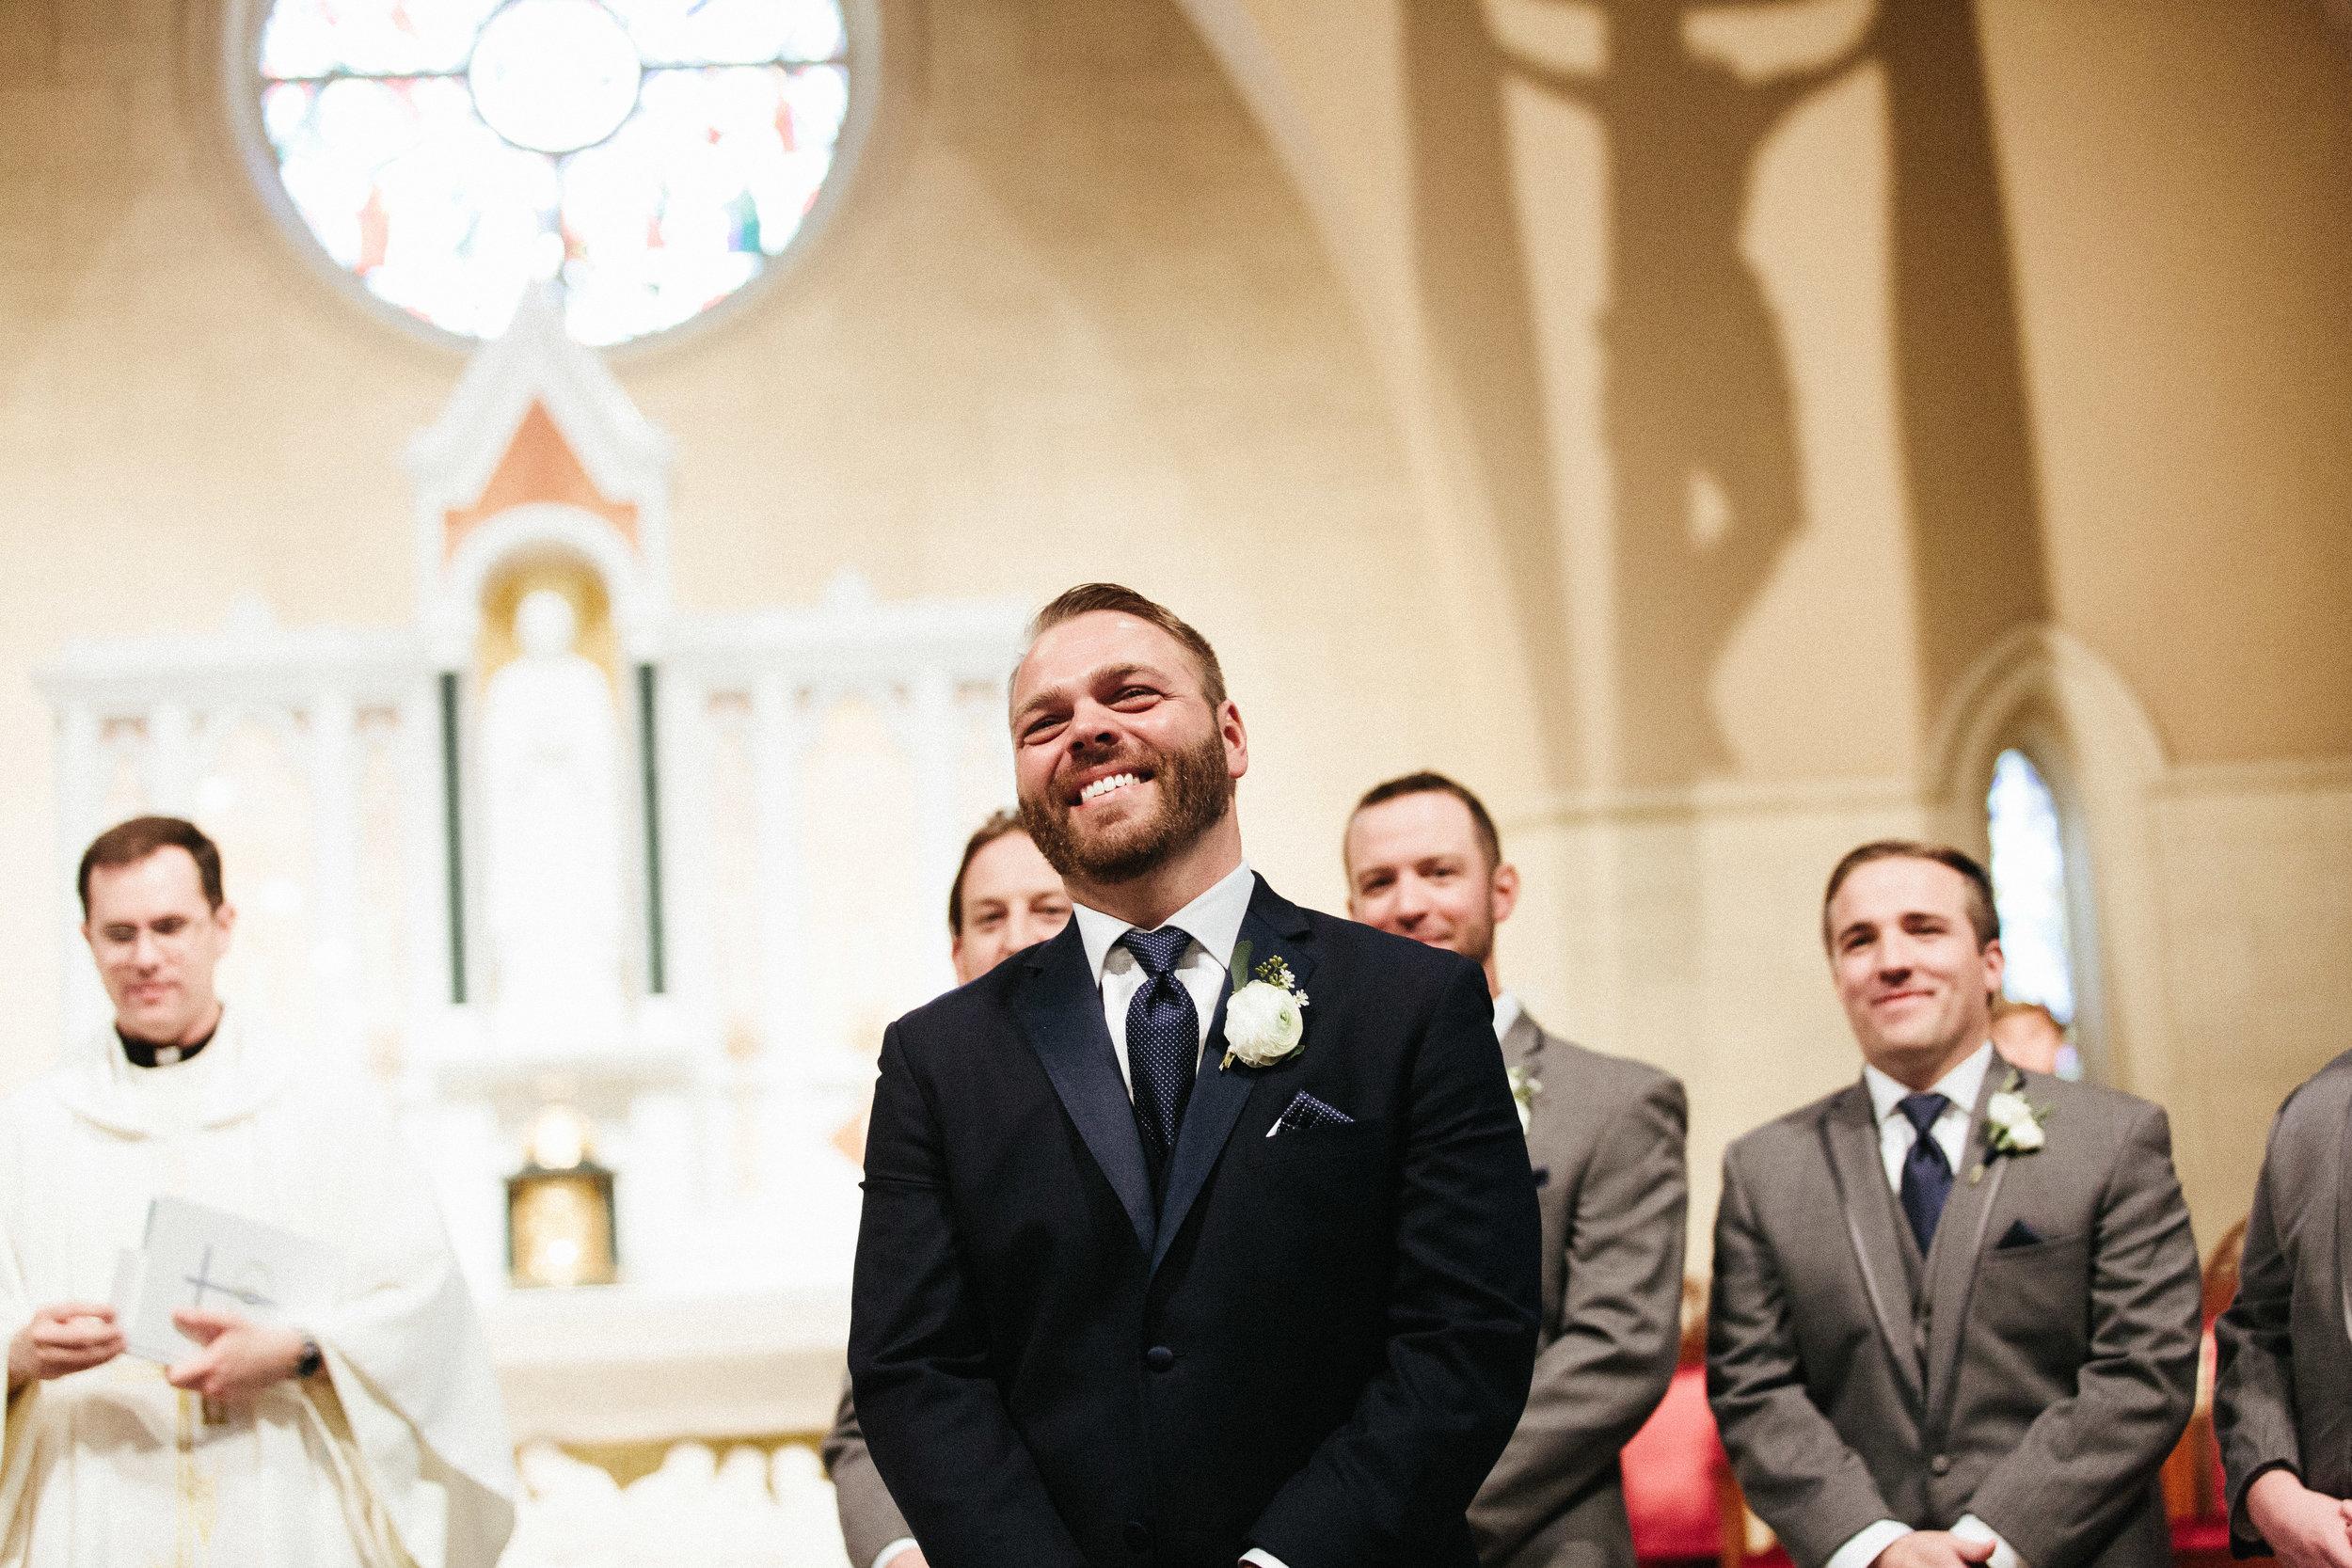 roswell_st_peter_chanel_catholic_avalon_hotel_alpharetta_wedding-1430.jpg